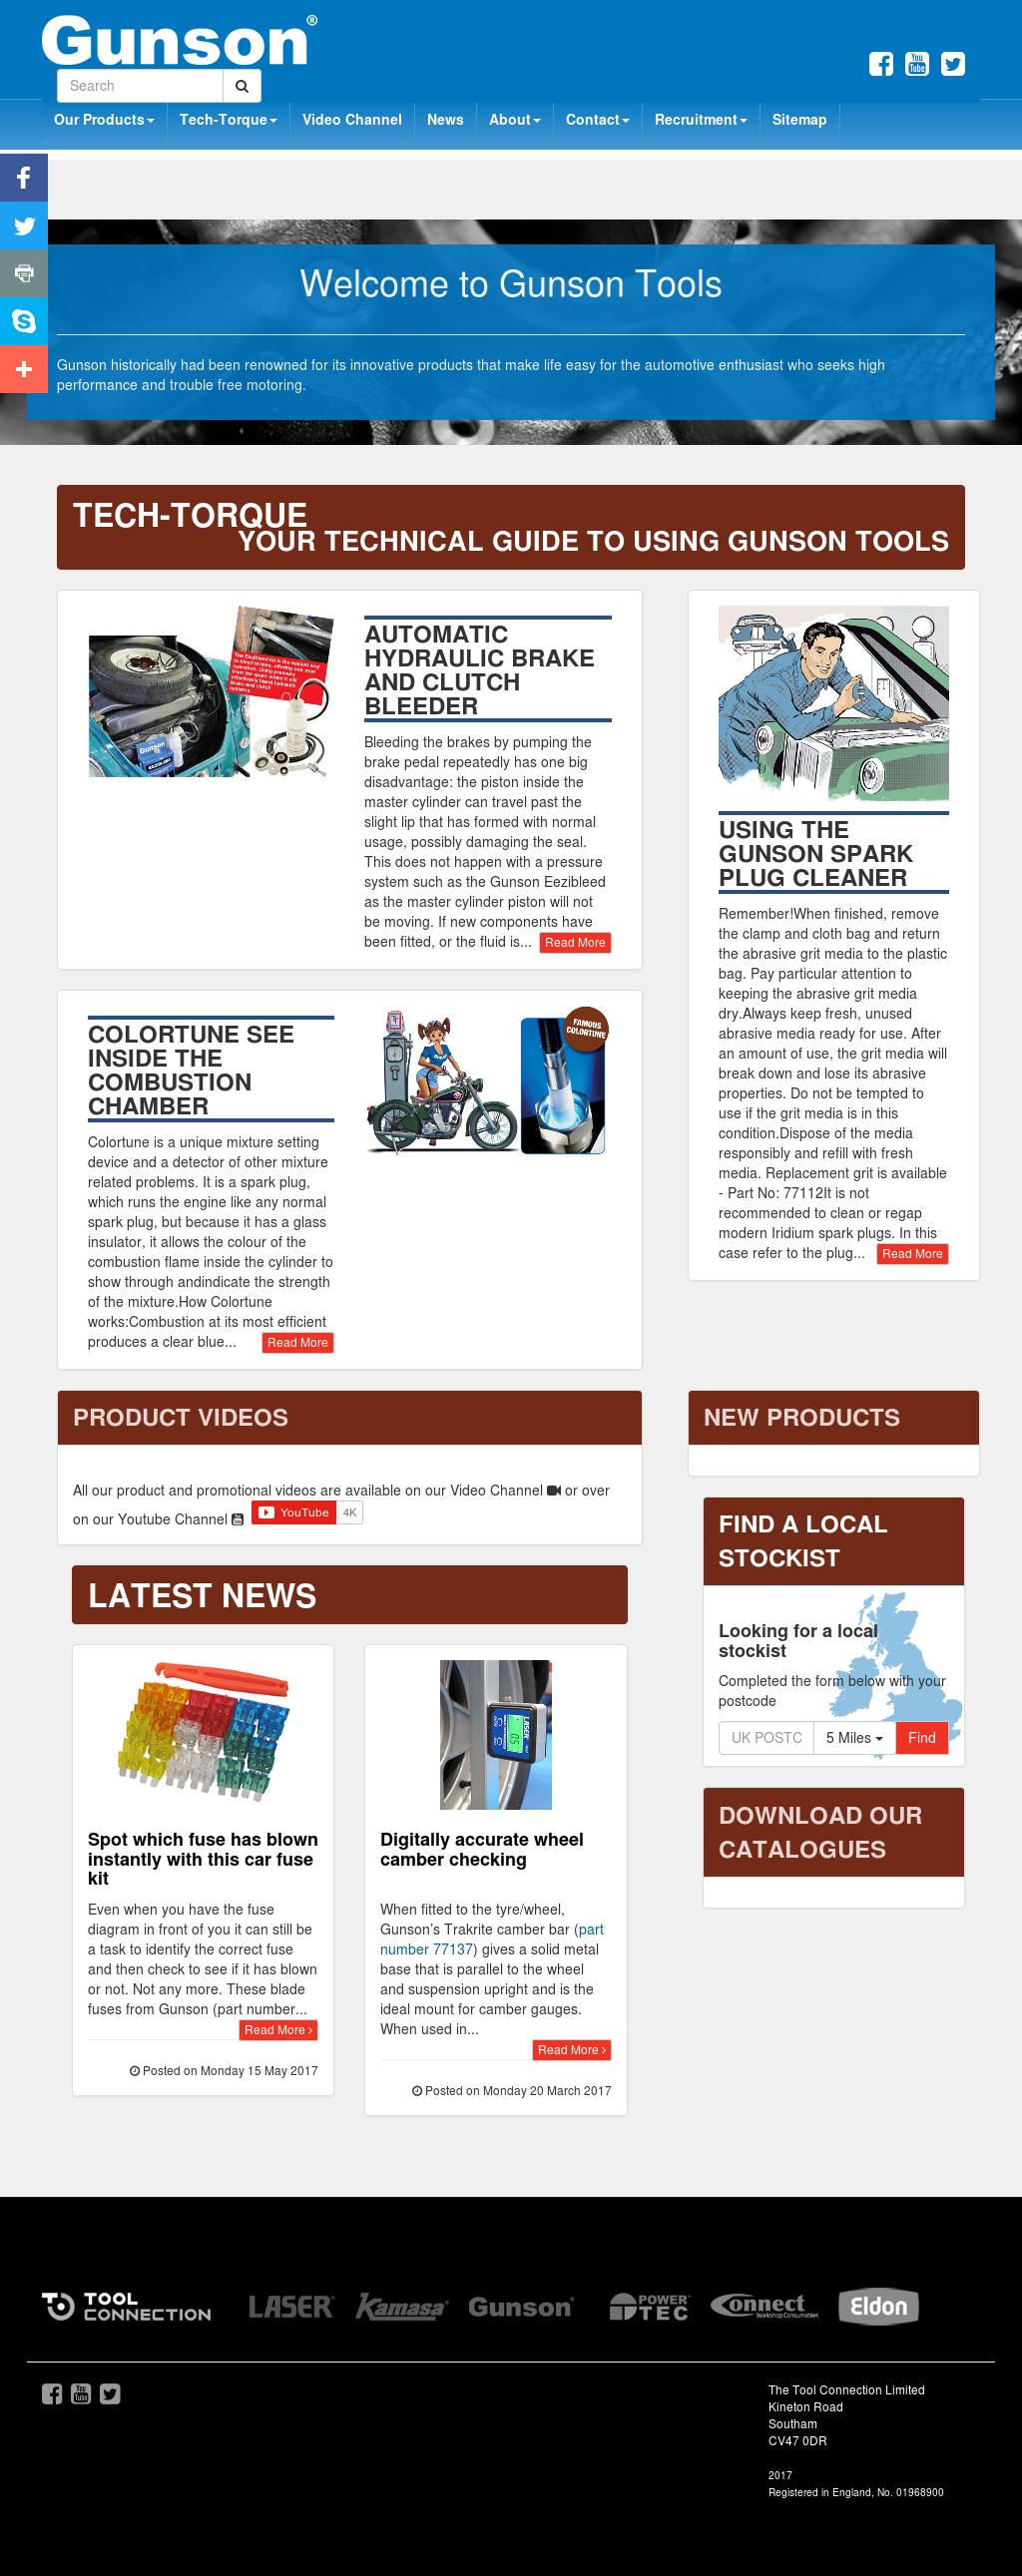 Gunson Competitors, Revenue and Employees - Owler Company Profile